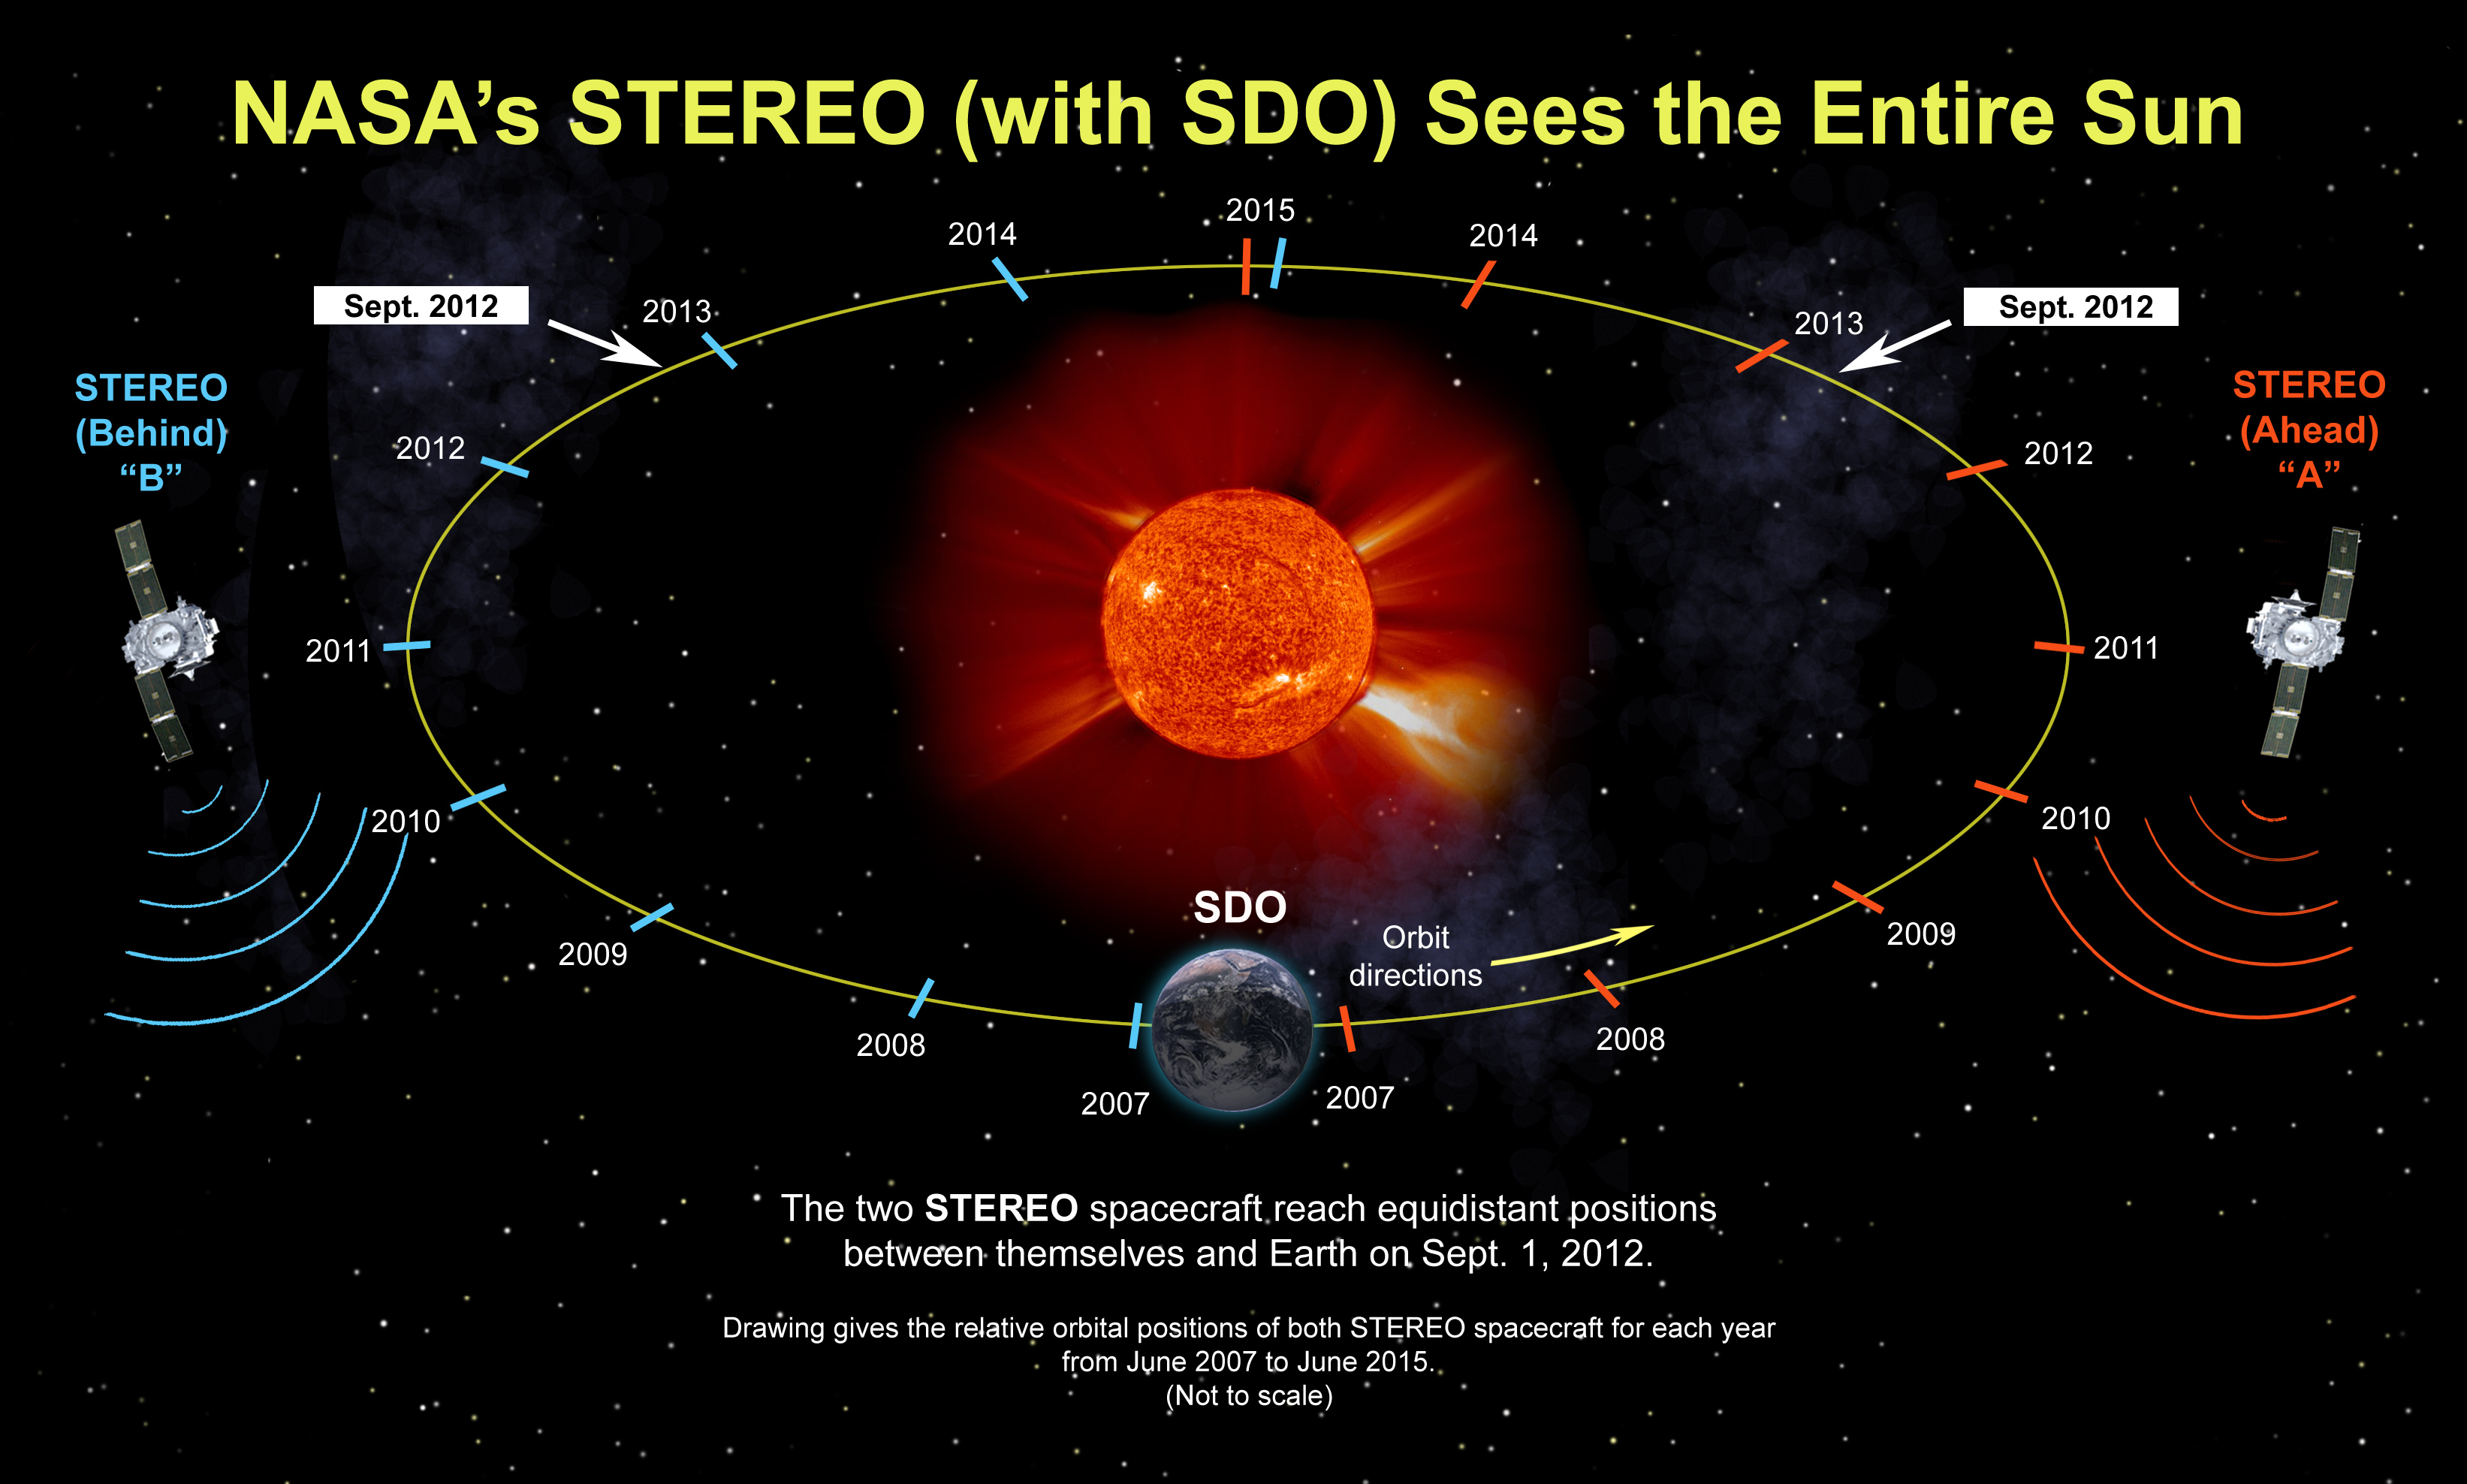 STEREO Reaches New Milestone At Its Sixth Anniversary | NASA